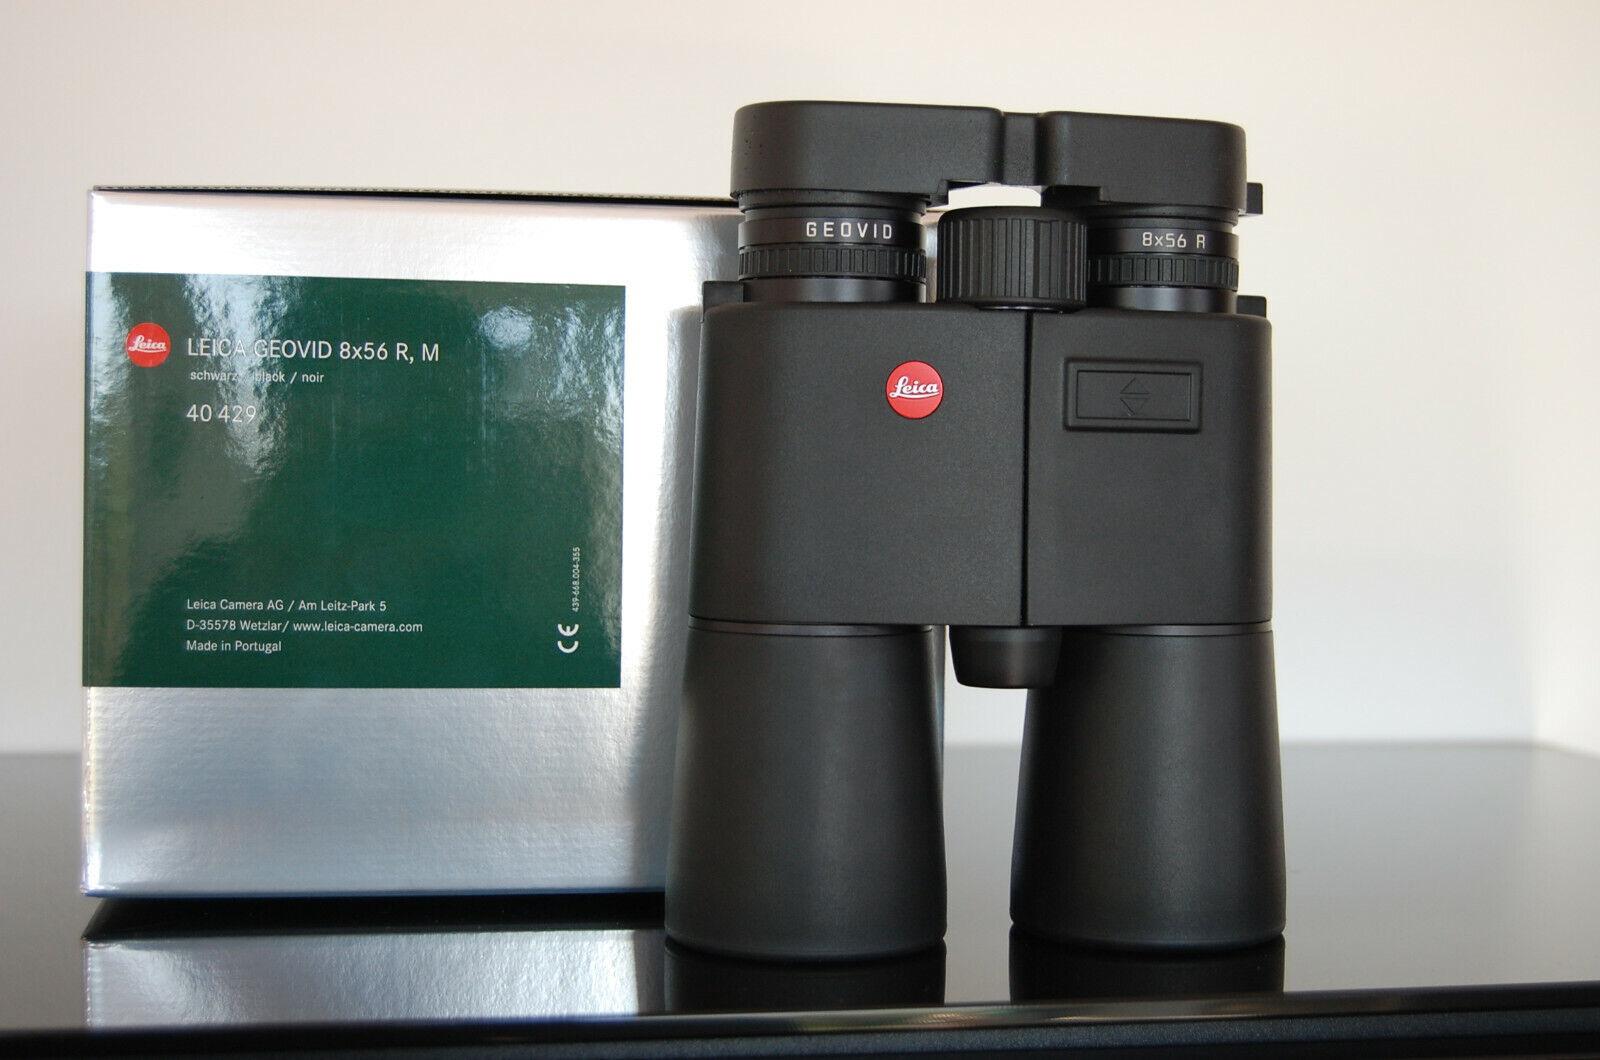 Leica Entfernungsmesser Crf : Leica fernglas mit entfernungsmesser: entfernungsmesser